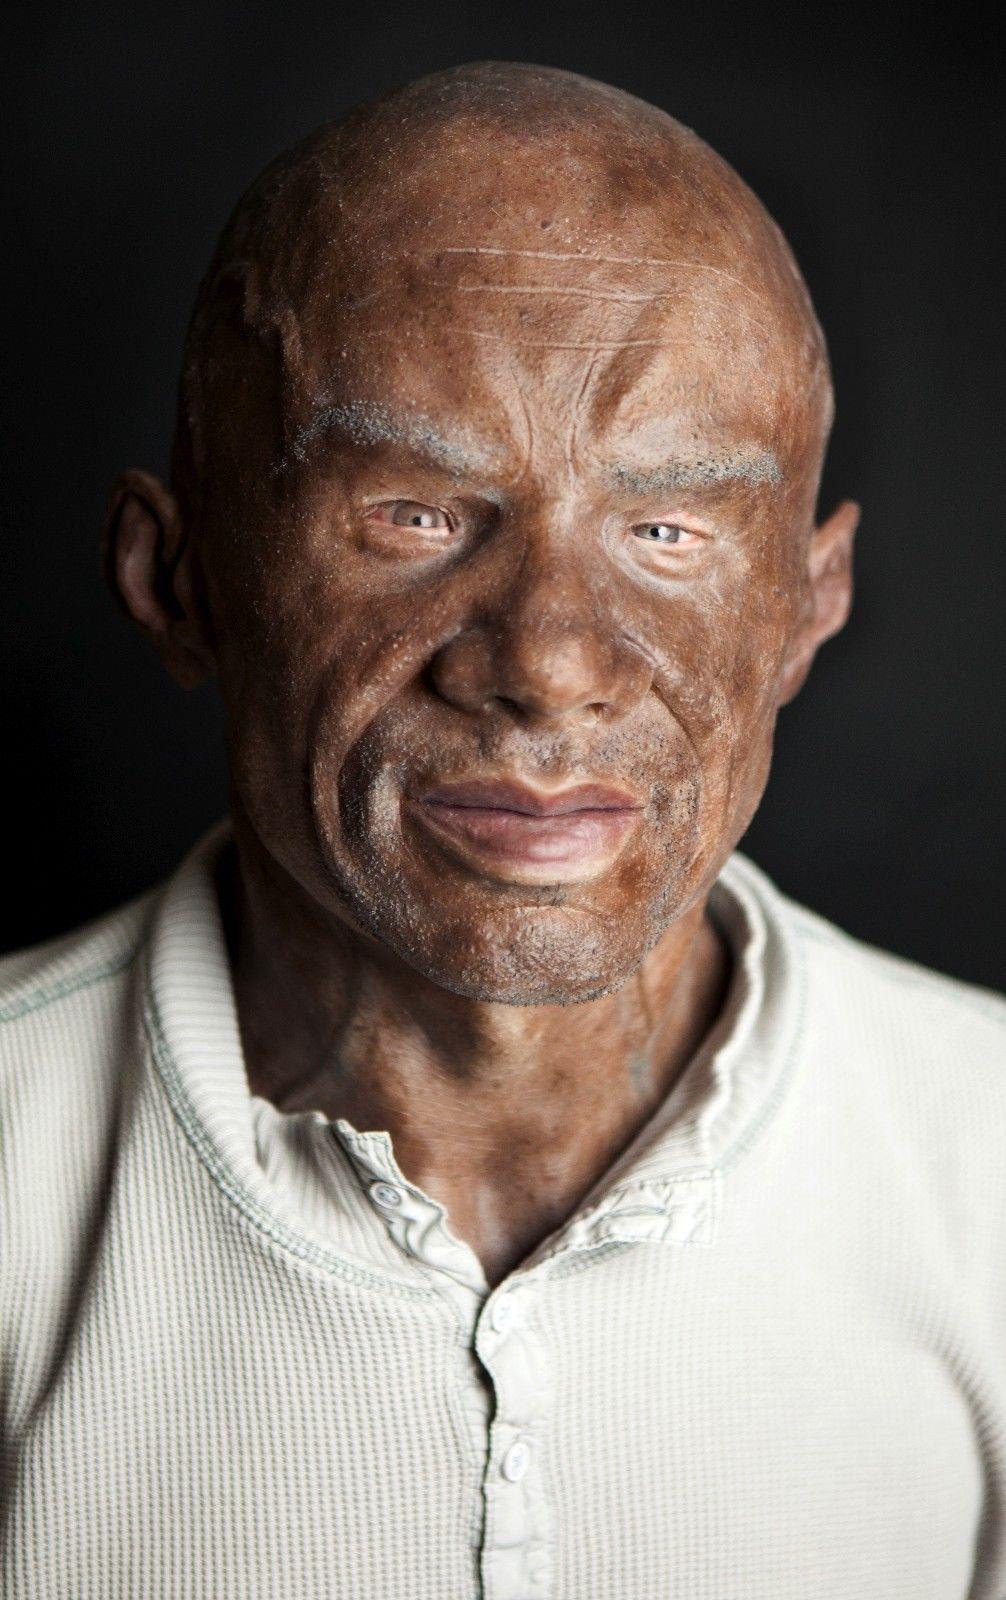 Details about The Soul Man Silicone masks by metamorphosemasks.com ...